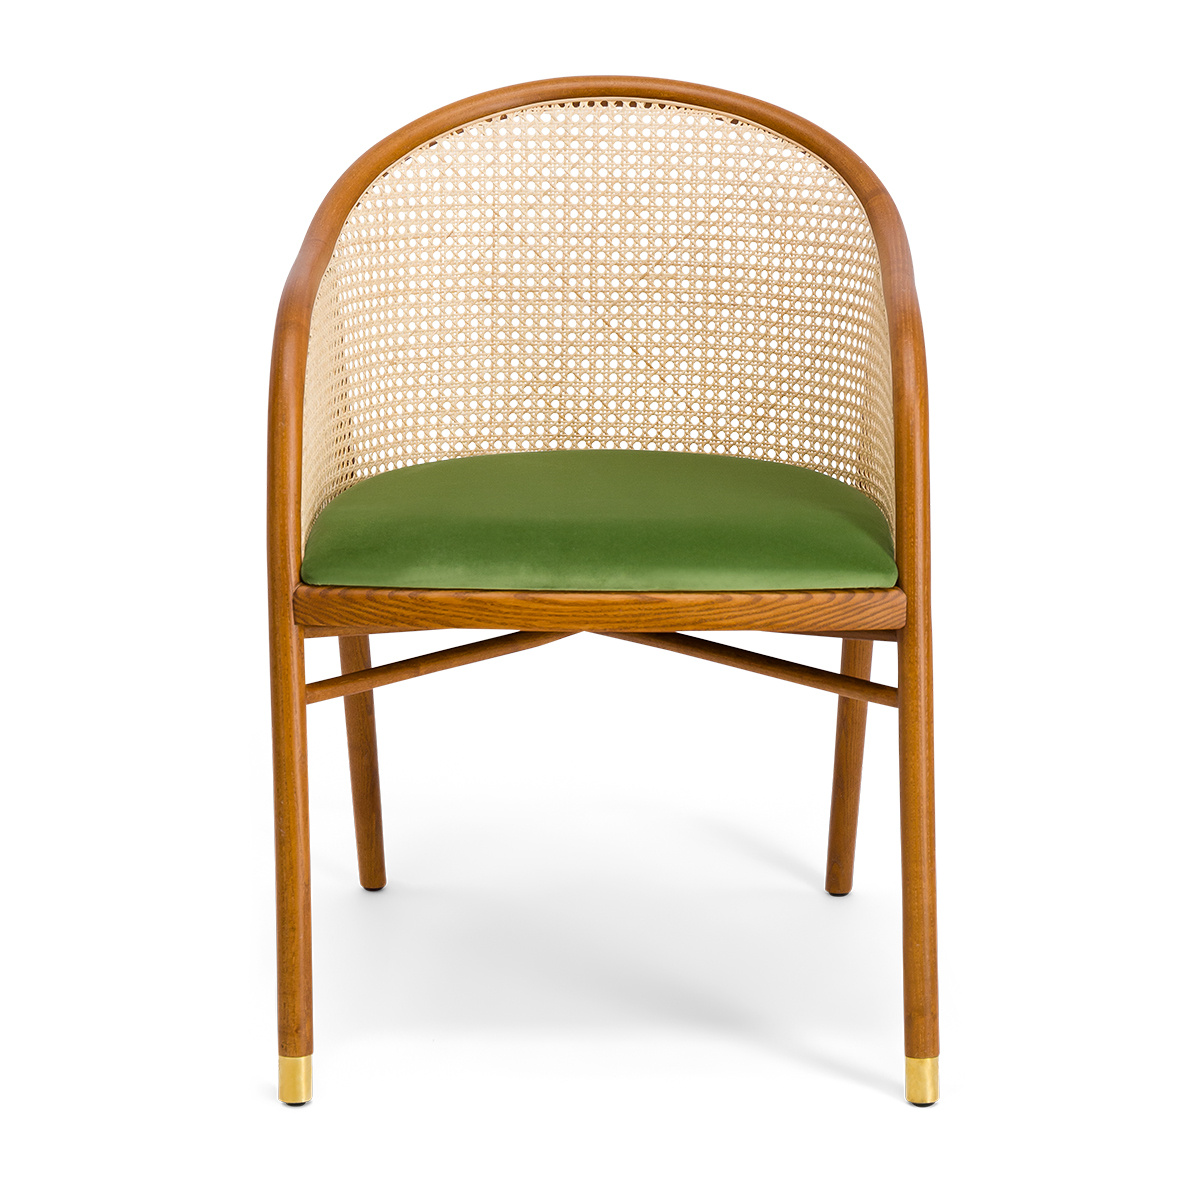 Cavallo Armchair, Almond Green Velvet with Cherrywood Frame